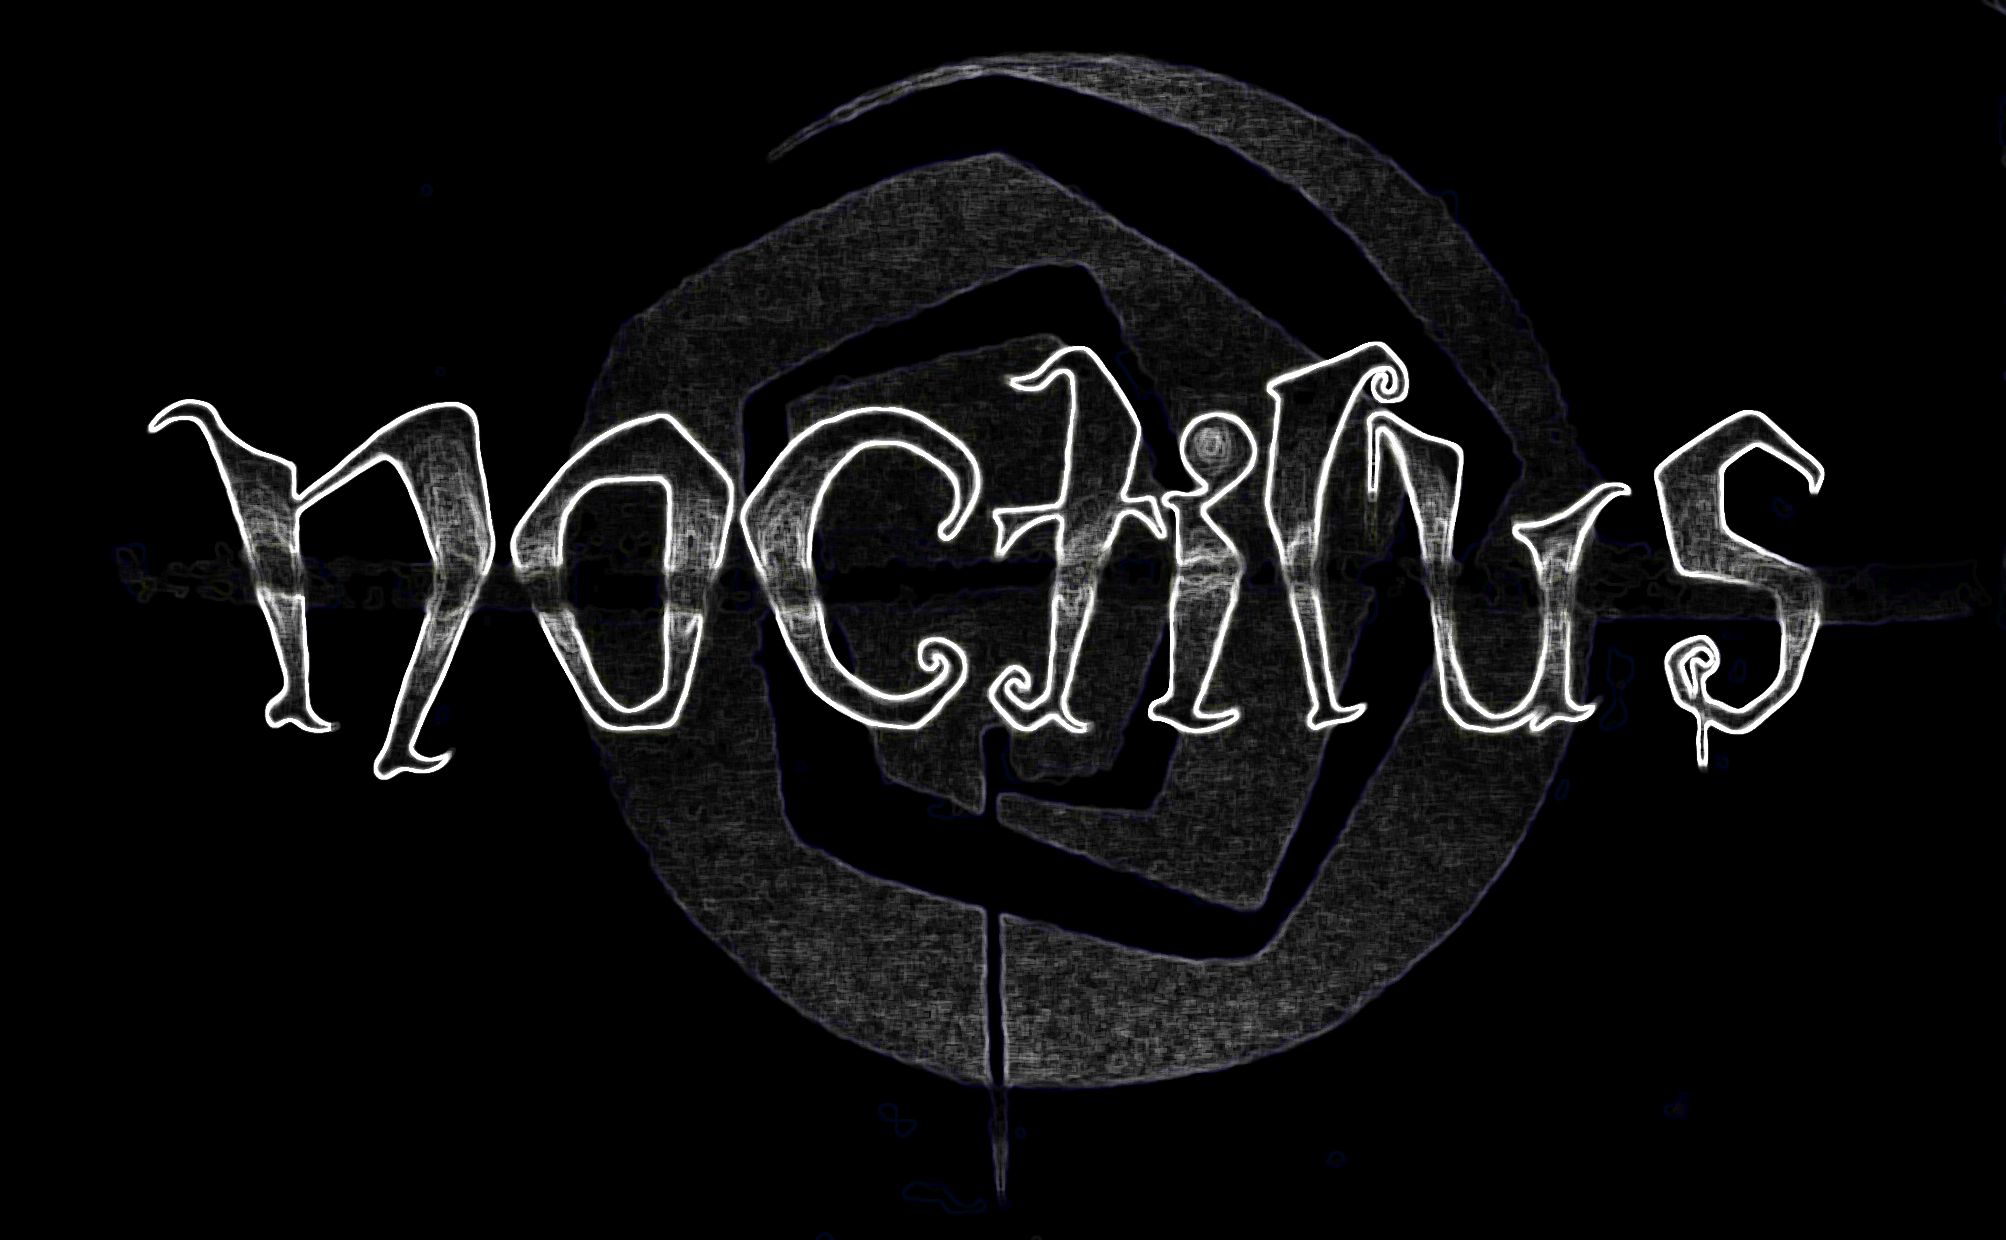 NOCTILUS - GenreMétal progressifTRIBUTE DREAM THEATERMembres du groupeFab - guitarsGab - vocalsNano - keyboardsYo - drumsFACEBOOKPAF : 7 €